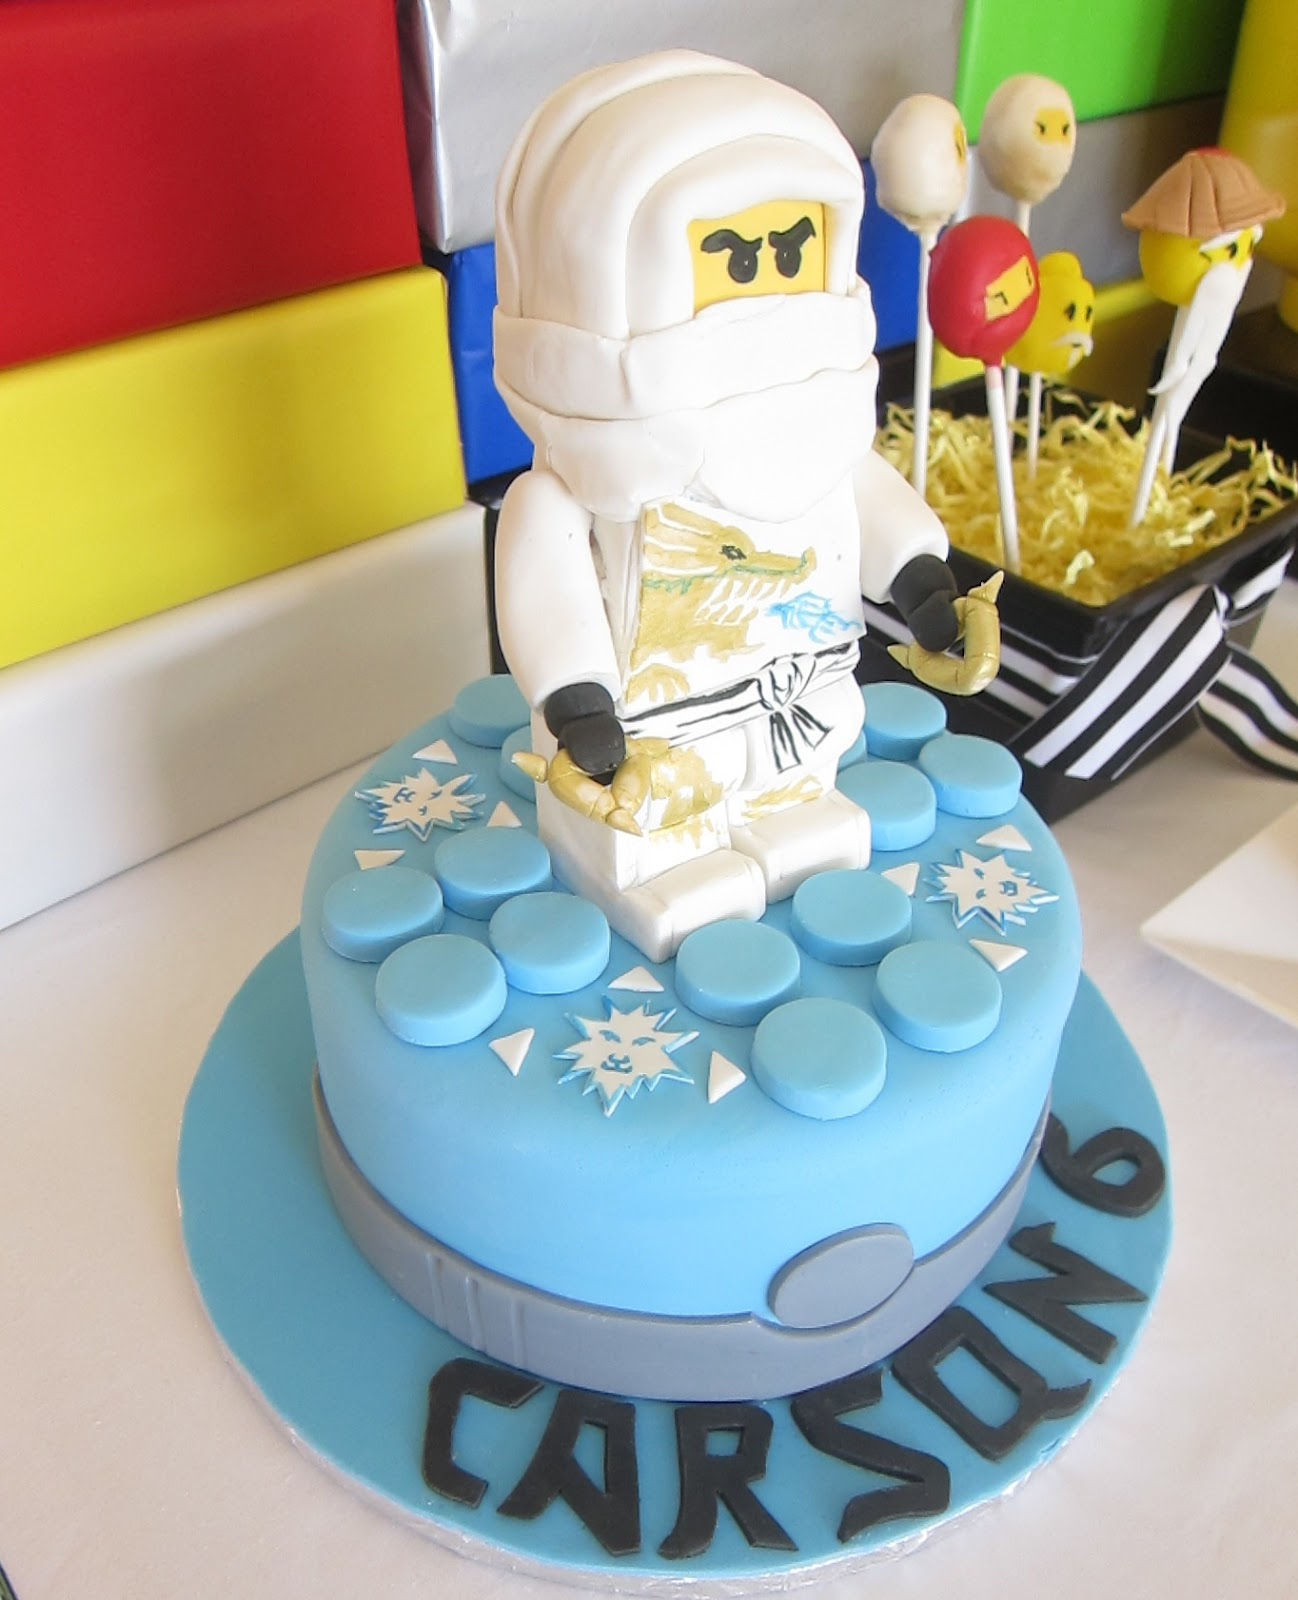 Target Decorated Birthday Cakes